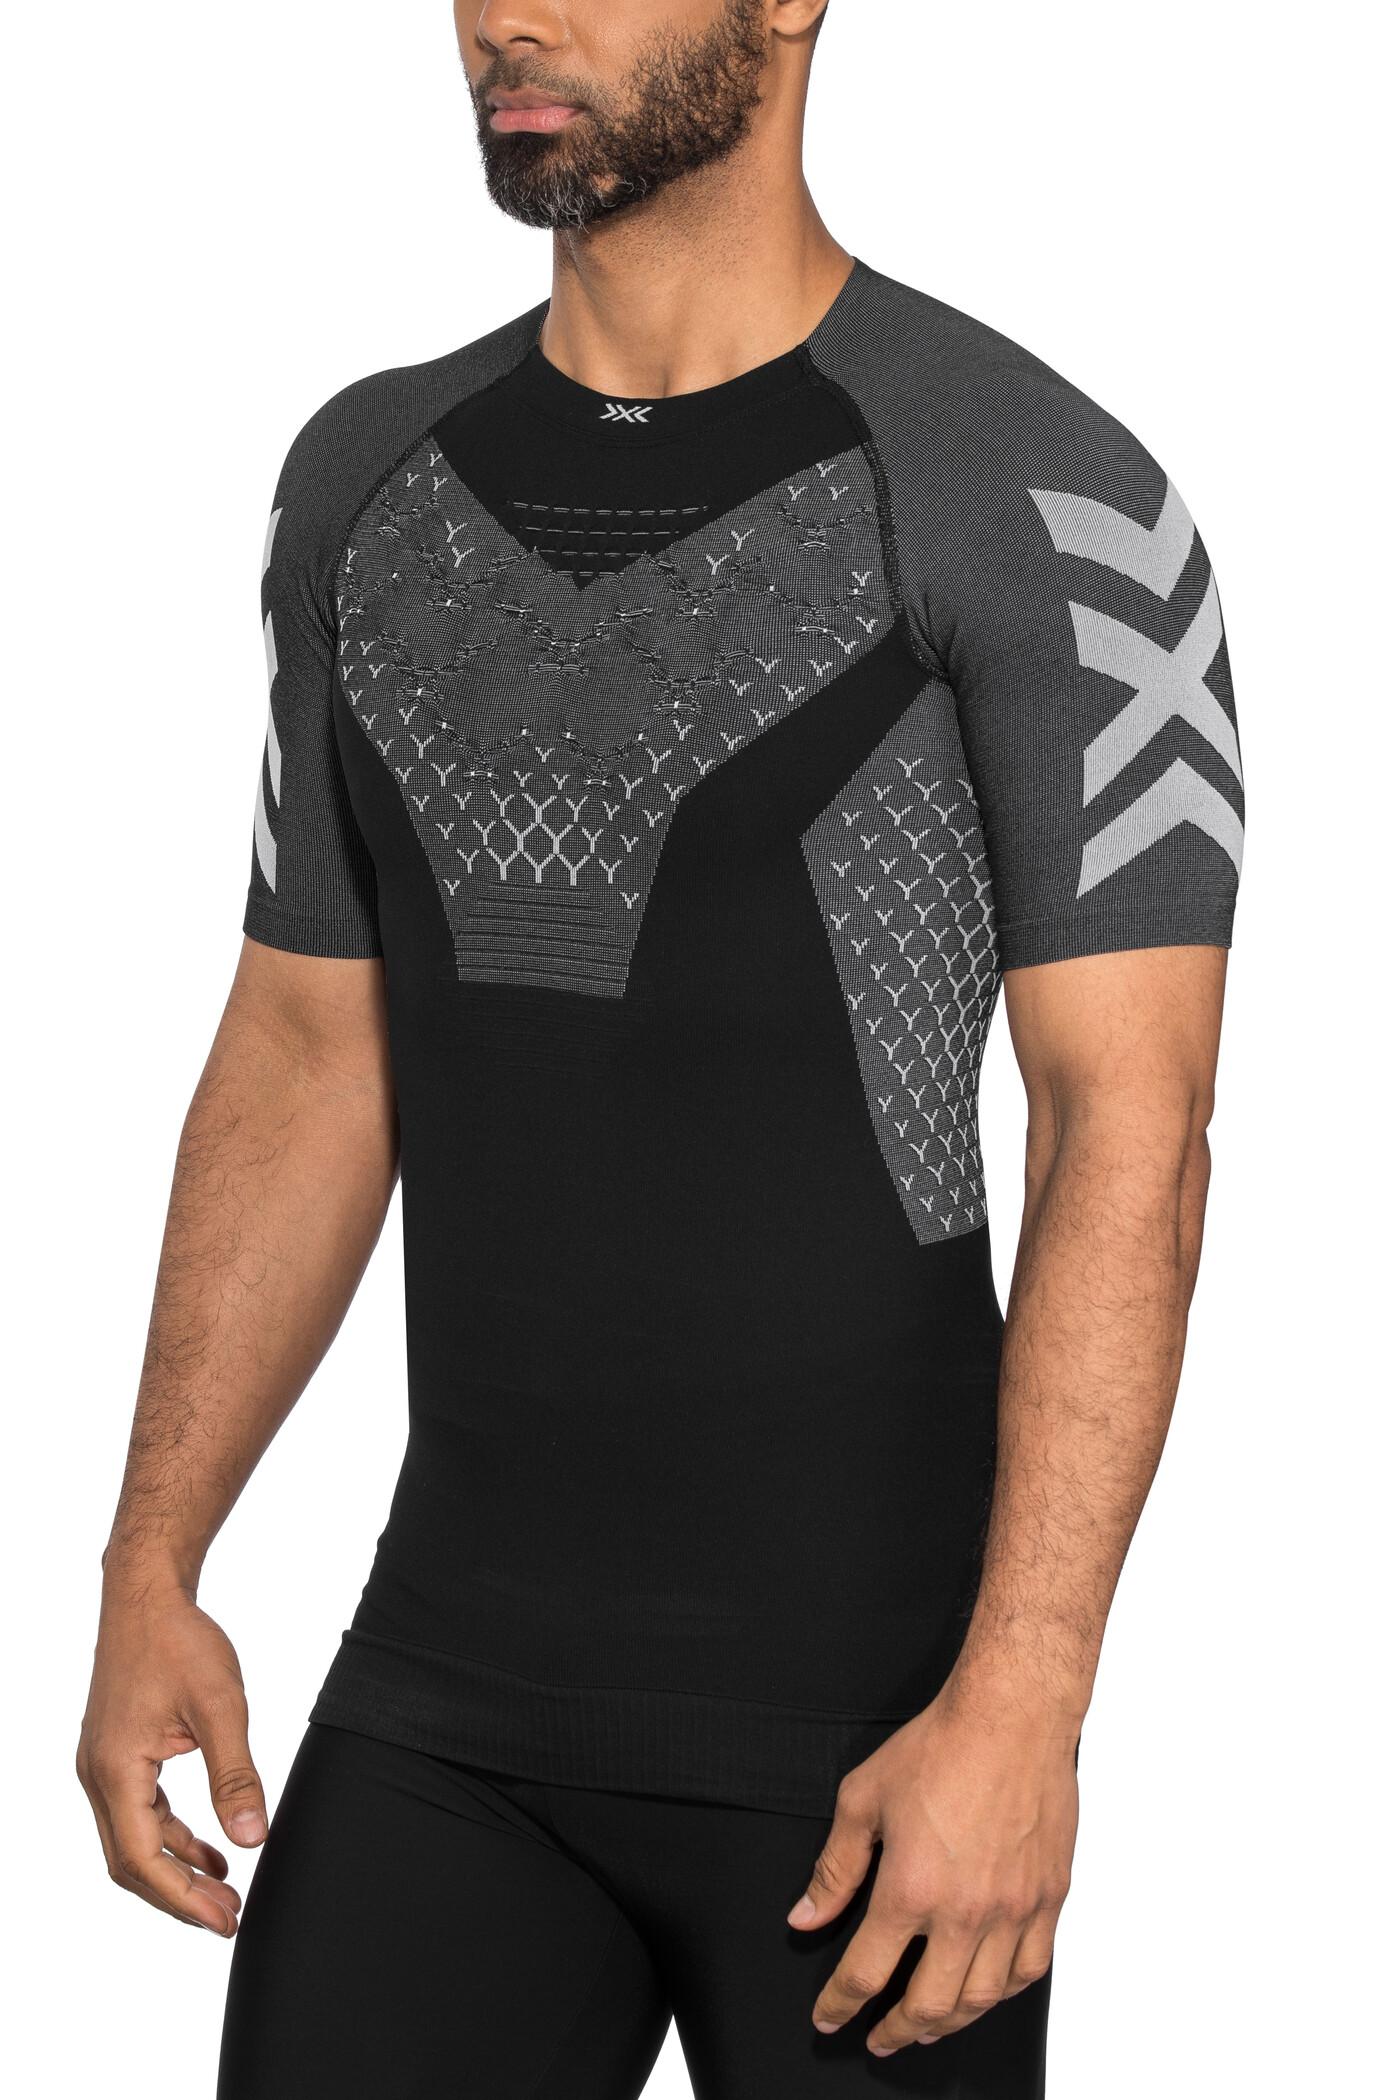 s www bikester at alpina ximo helmet dog 900033 html 2019 07x bionic_twyce_g2_run_shirt_ss_herren_black_melange jpg